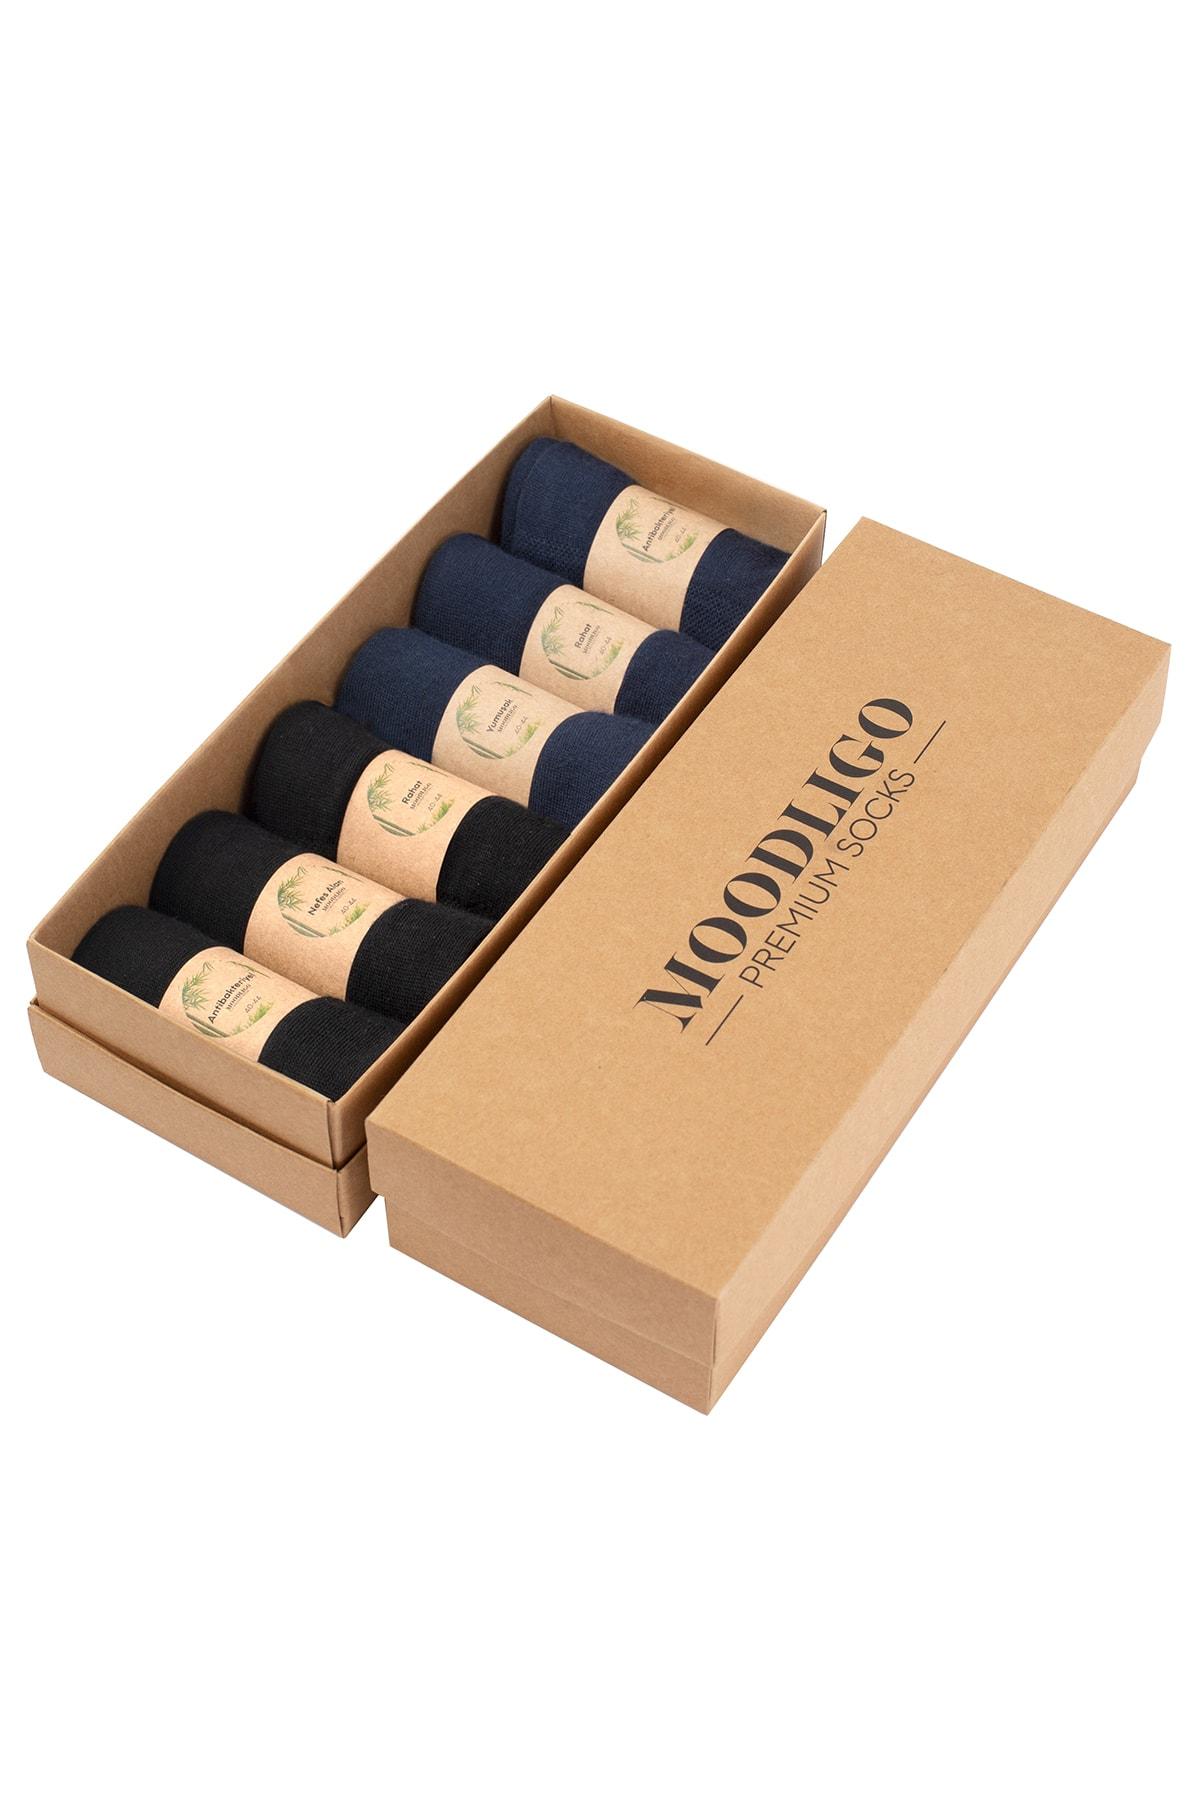 Moodligo Premium 6'lı Erkek Bambu Çorap - 3 Siyah 3Lacivert 1